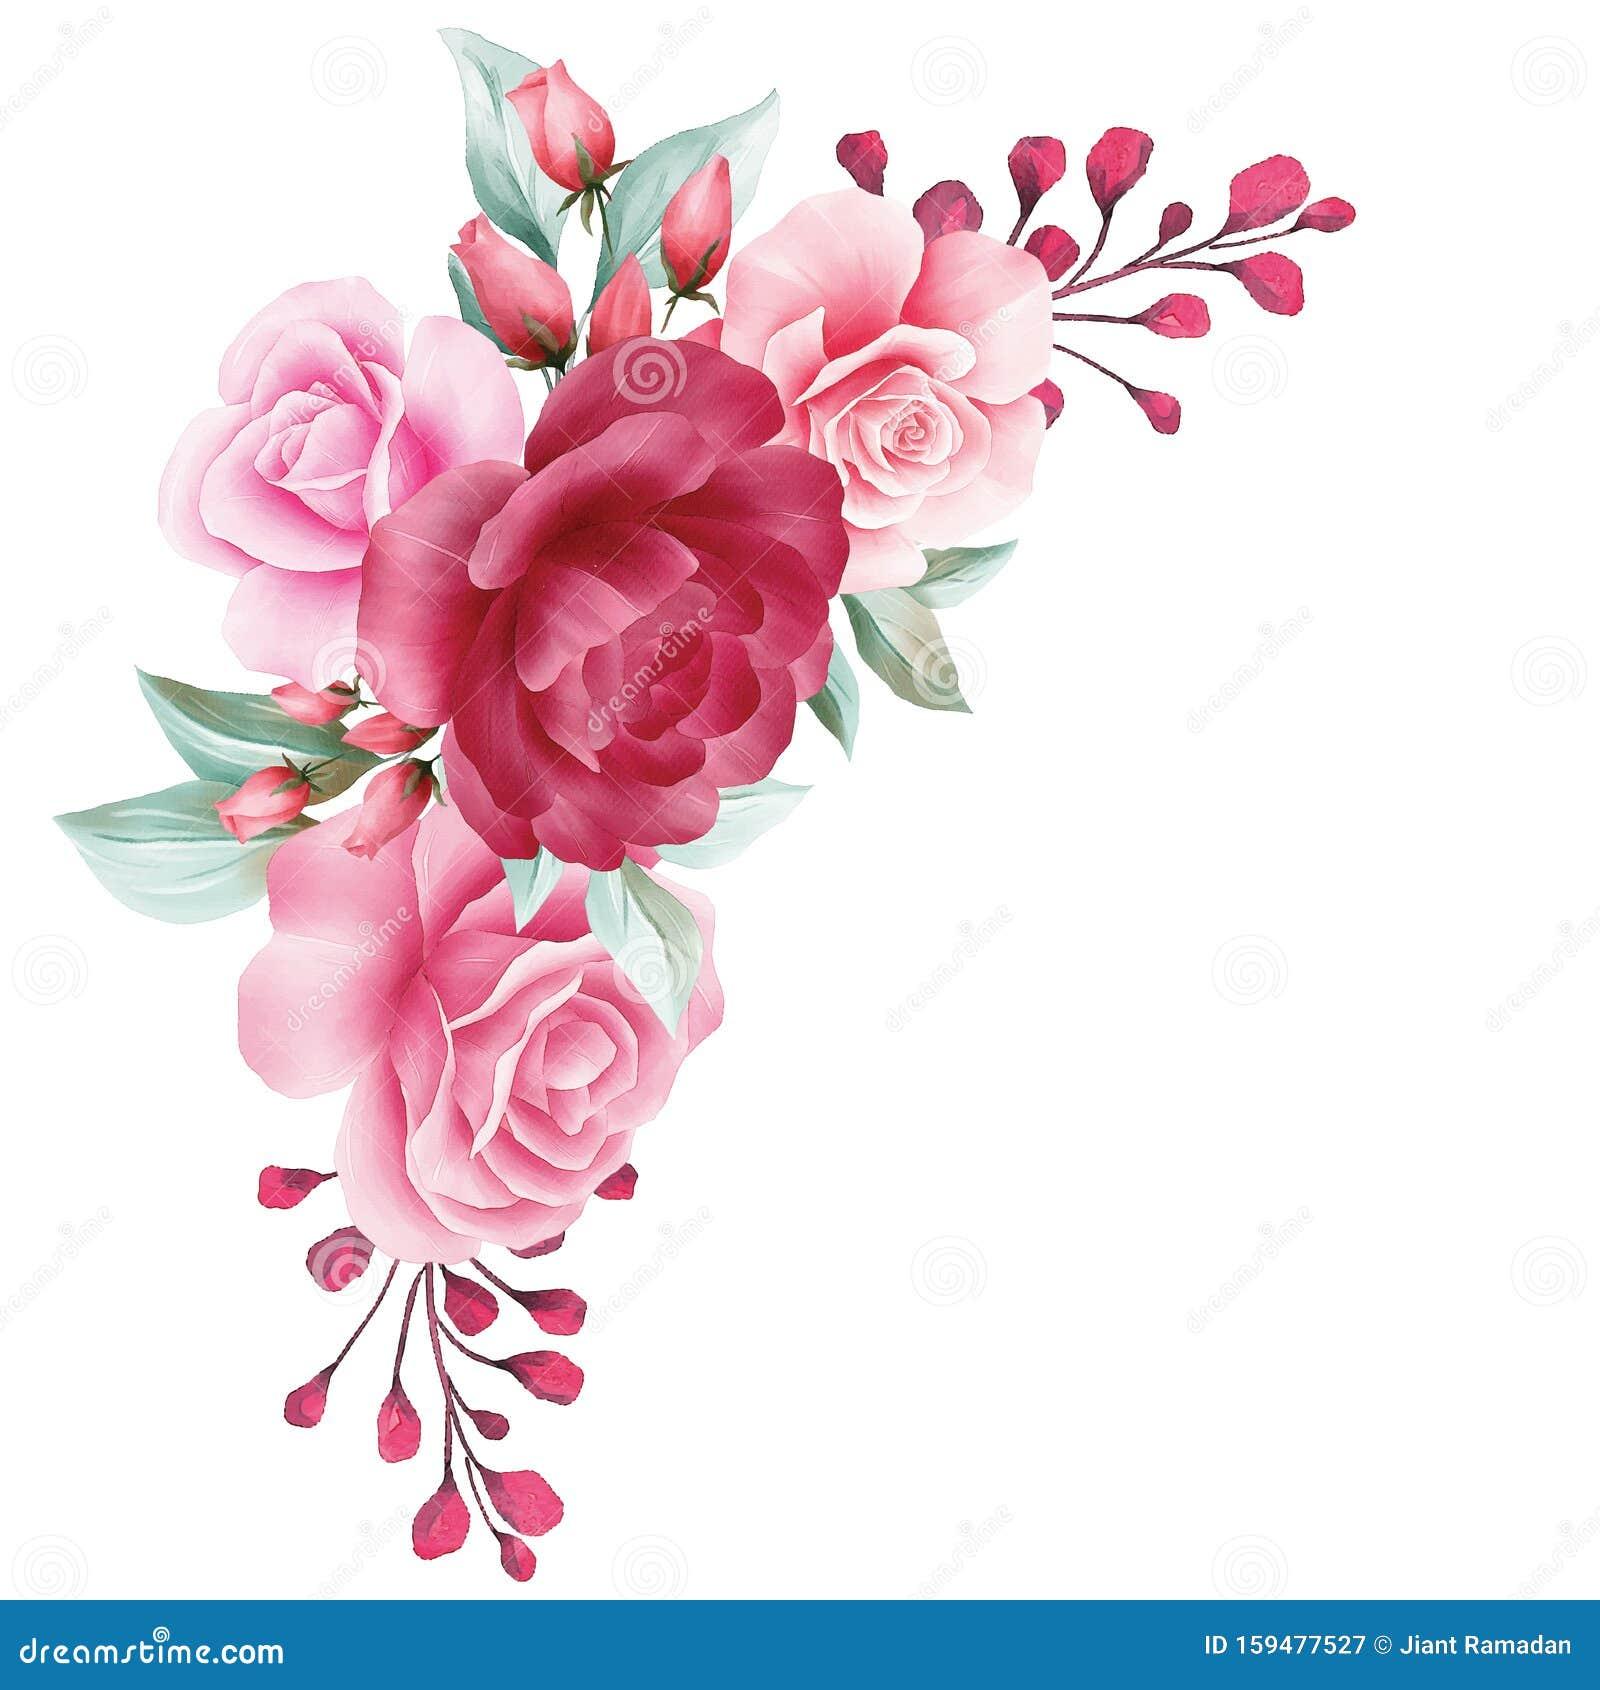 floral decoration for wedding invitation card border